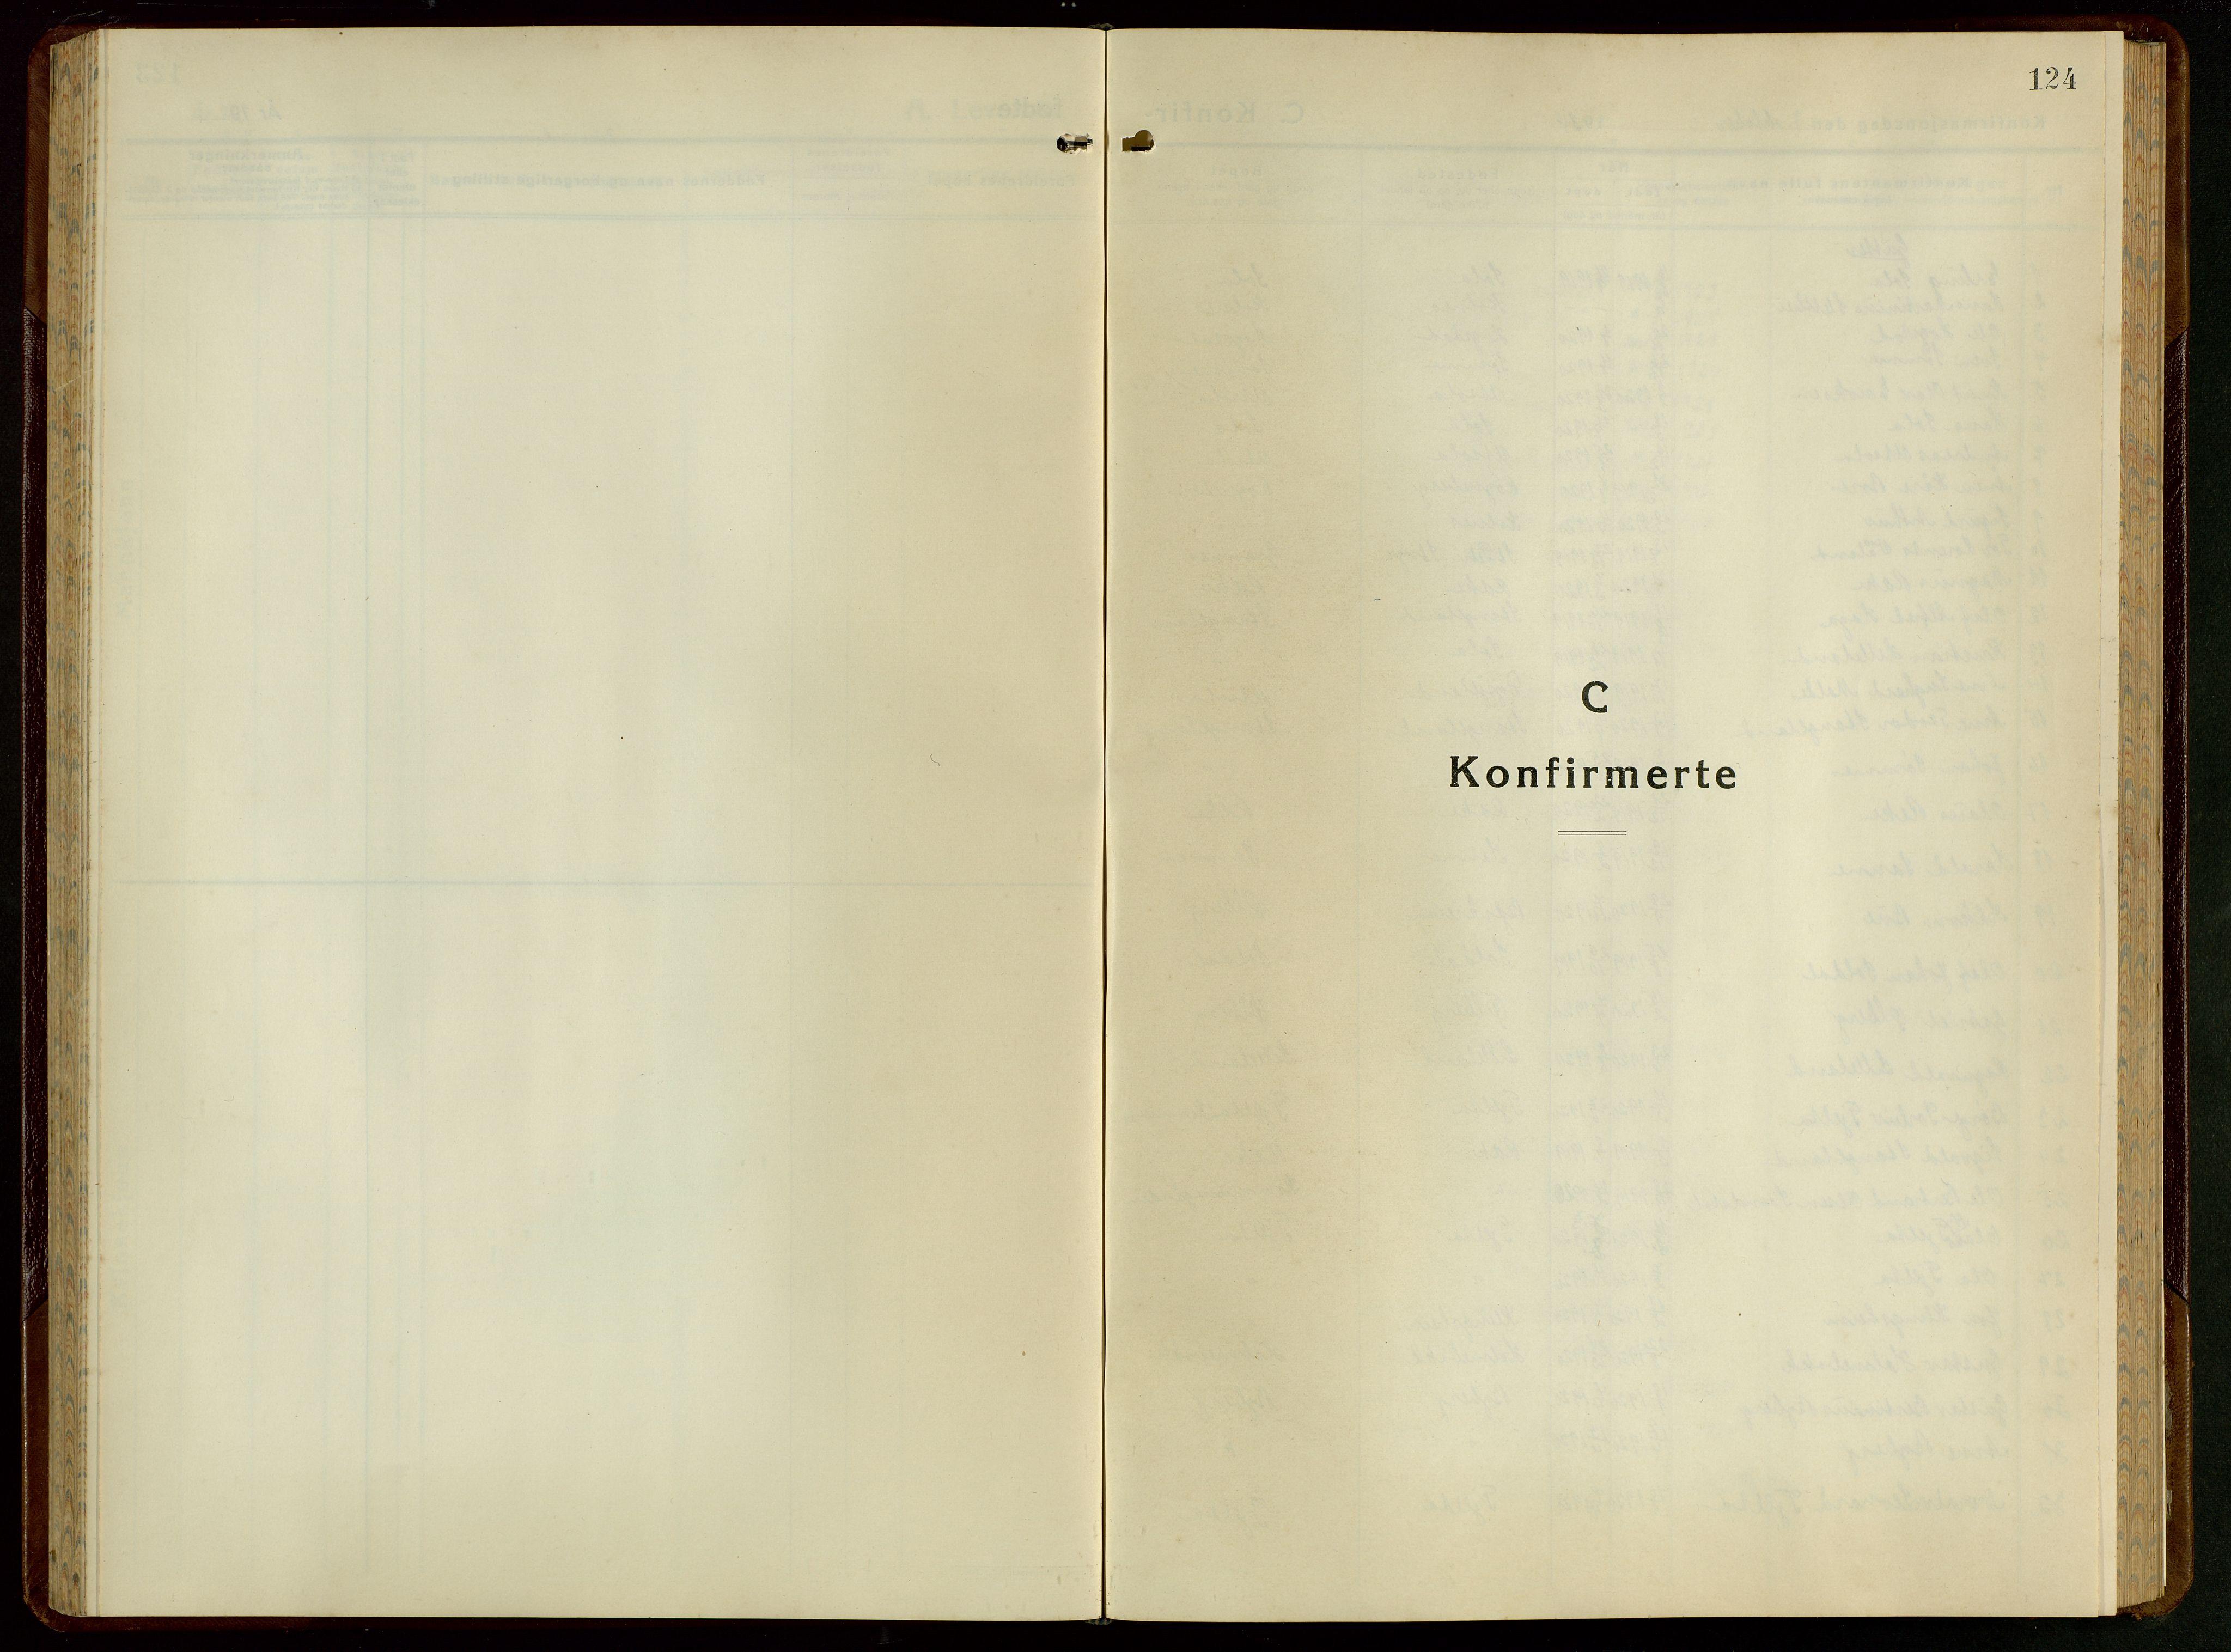 SAST, Håland sokneprestkontor, 30BB/L0005: Klokkerbok nr. B 5, 1934-1955, s. 124